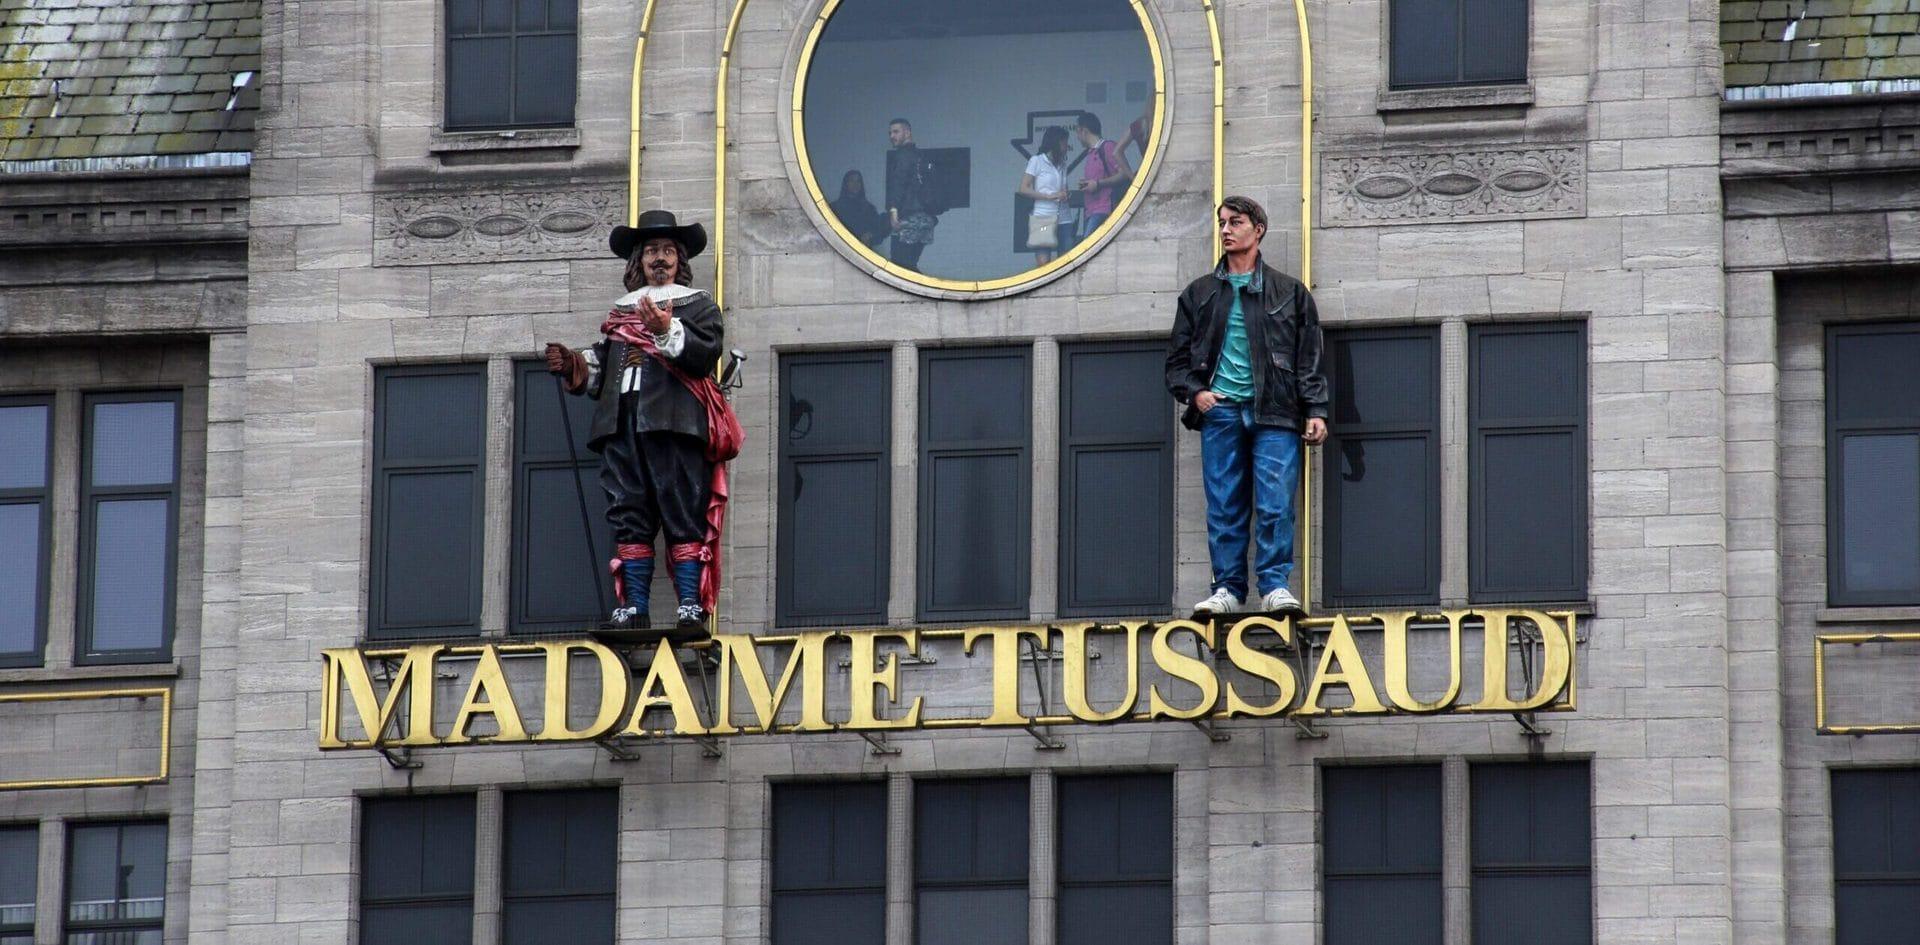 Studietur Amsterdam Madame Tussauds